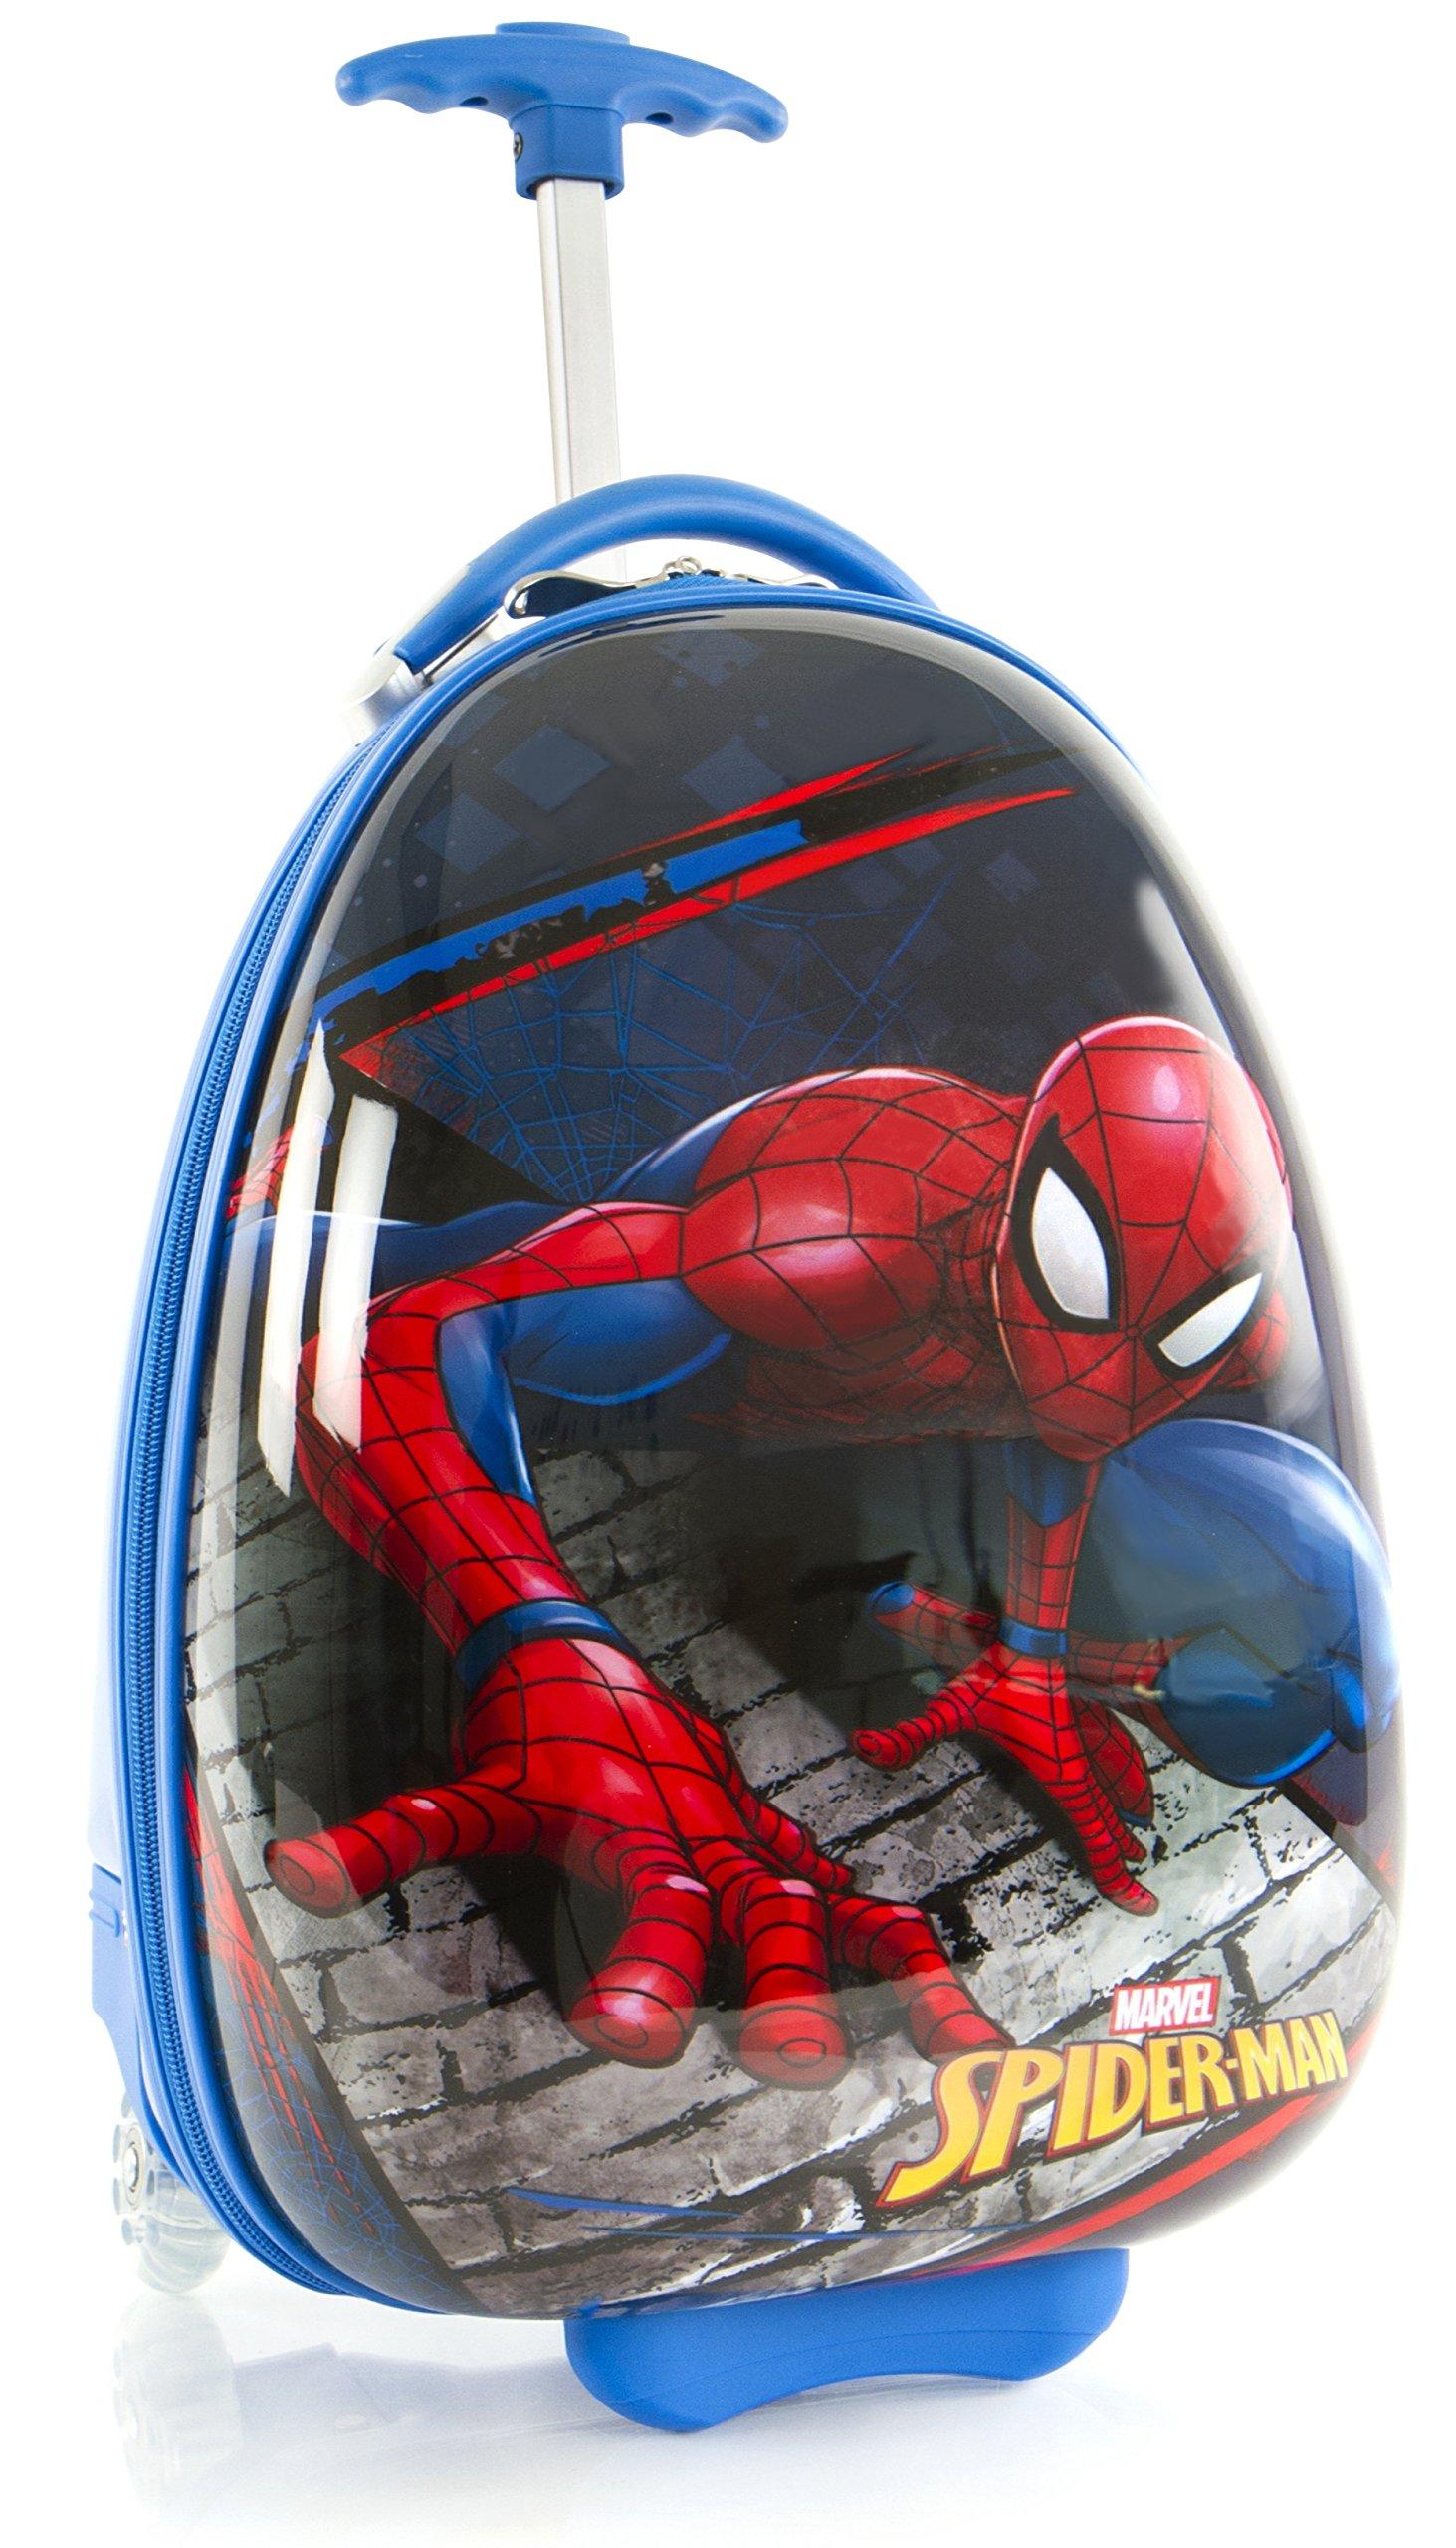 Heys Marvel Spiderman Kids Luggage 18 Inch Carry on